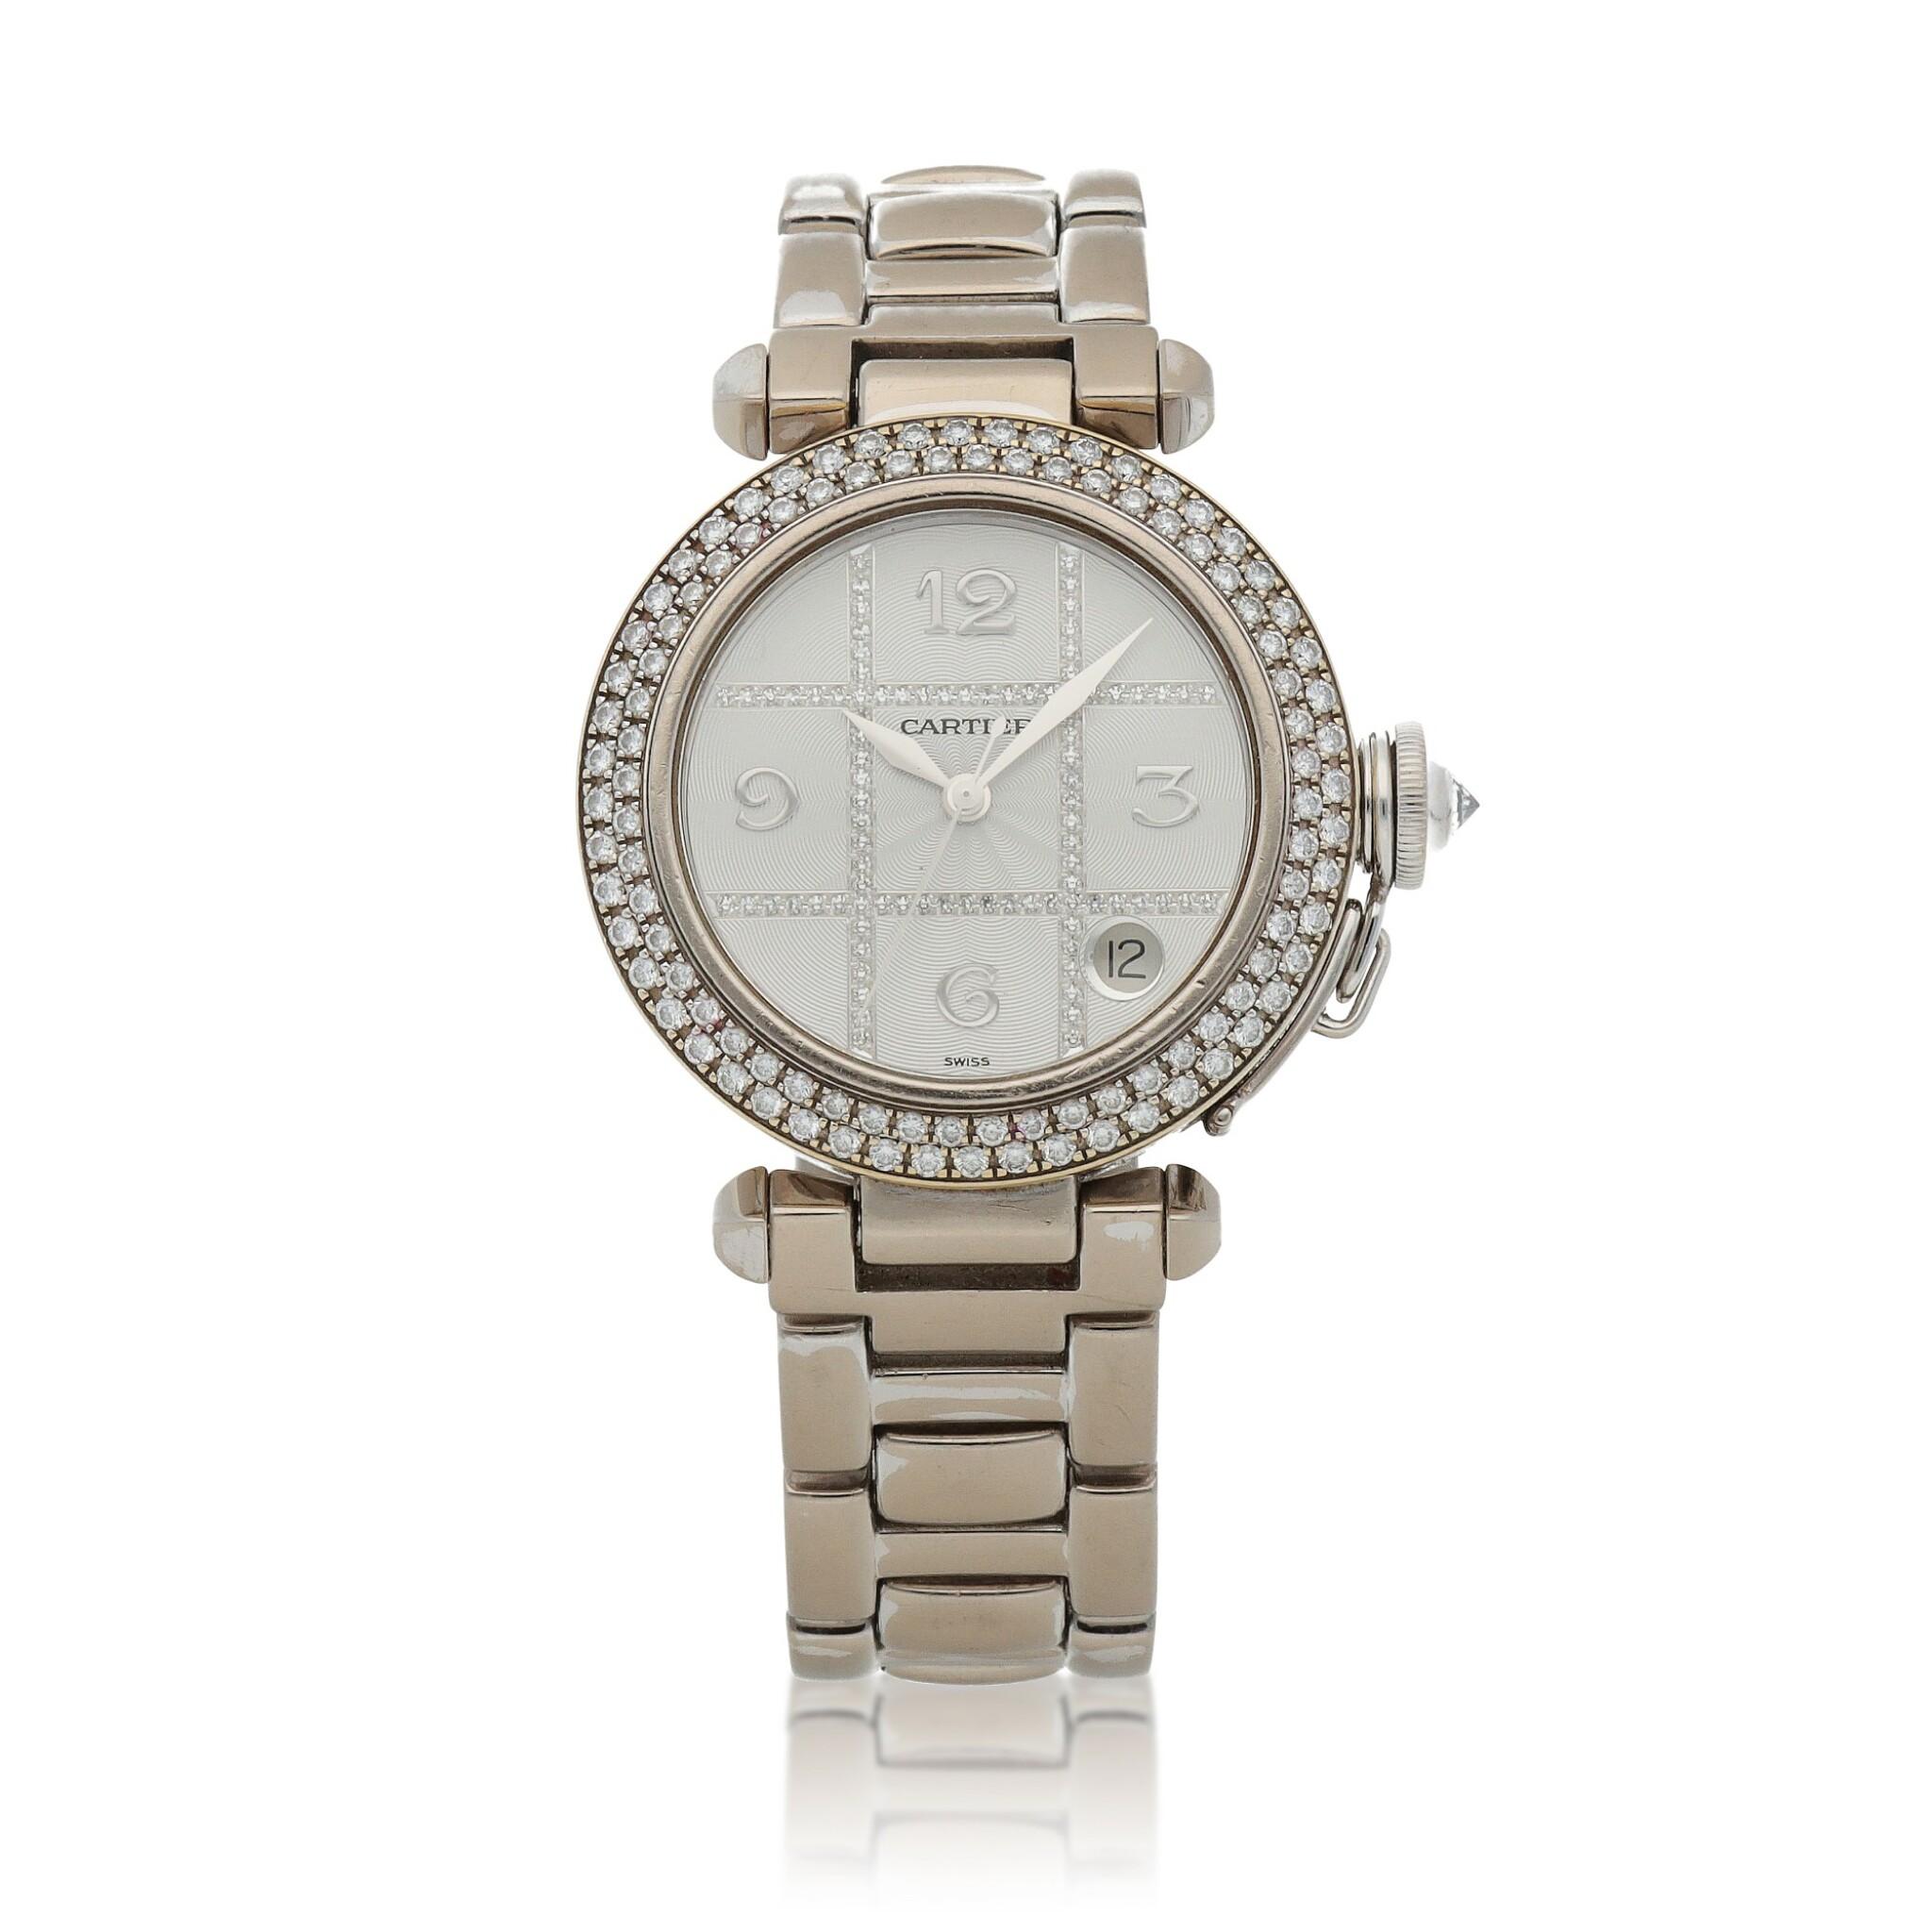 View full screen - View 1 of Lot 472. Pasha, Ref. 2308 White gold and diamond-set wristwatch with date and bracelet Circa 2000   卡地亞 2308型號「Pasha」白金鑲鑽石鍊帶腕錶備日期顯示,年份約2000.